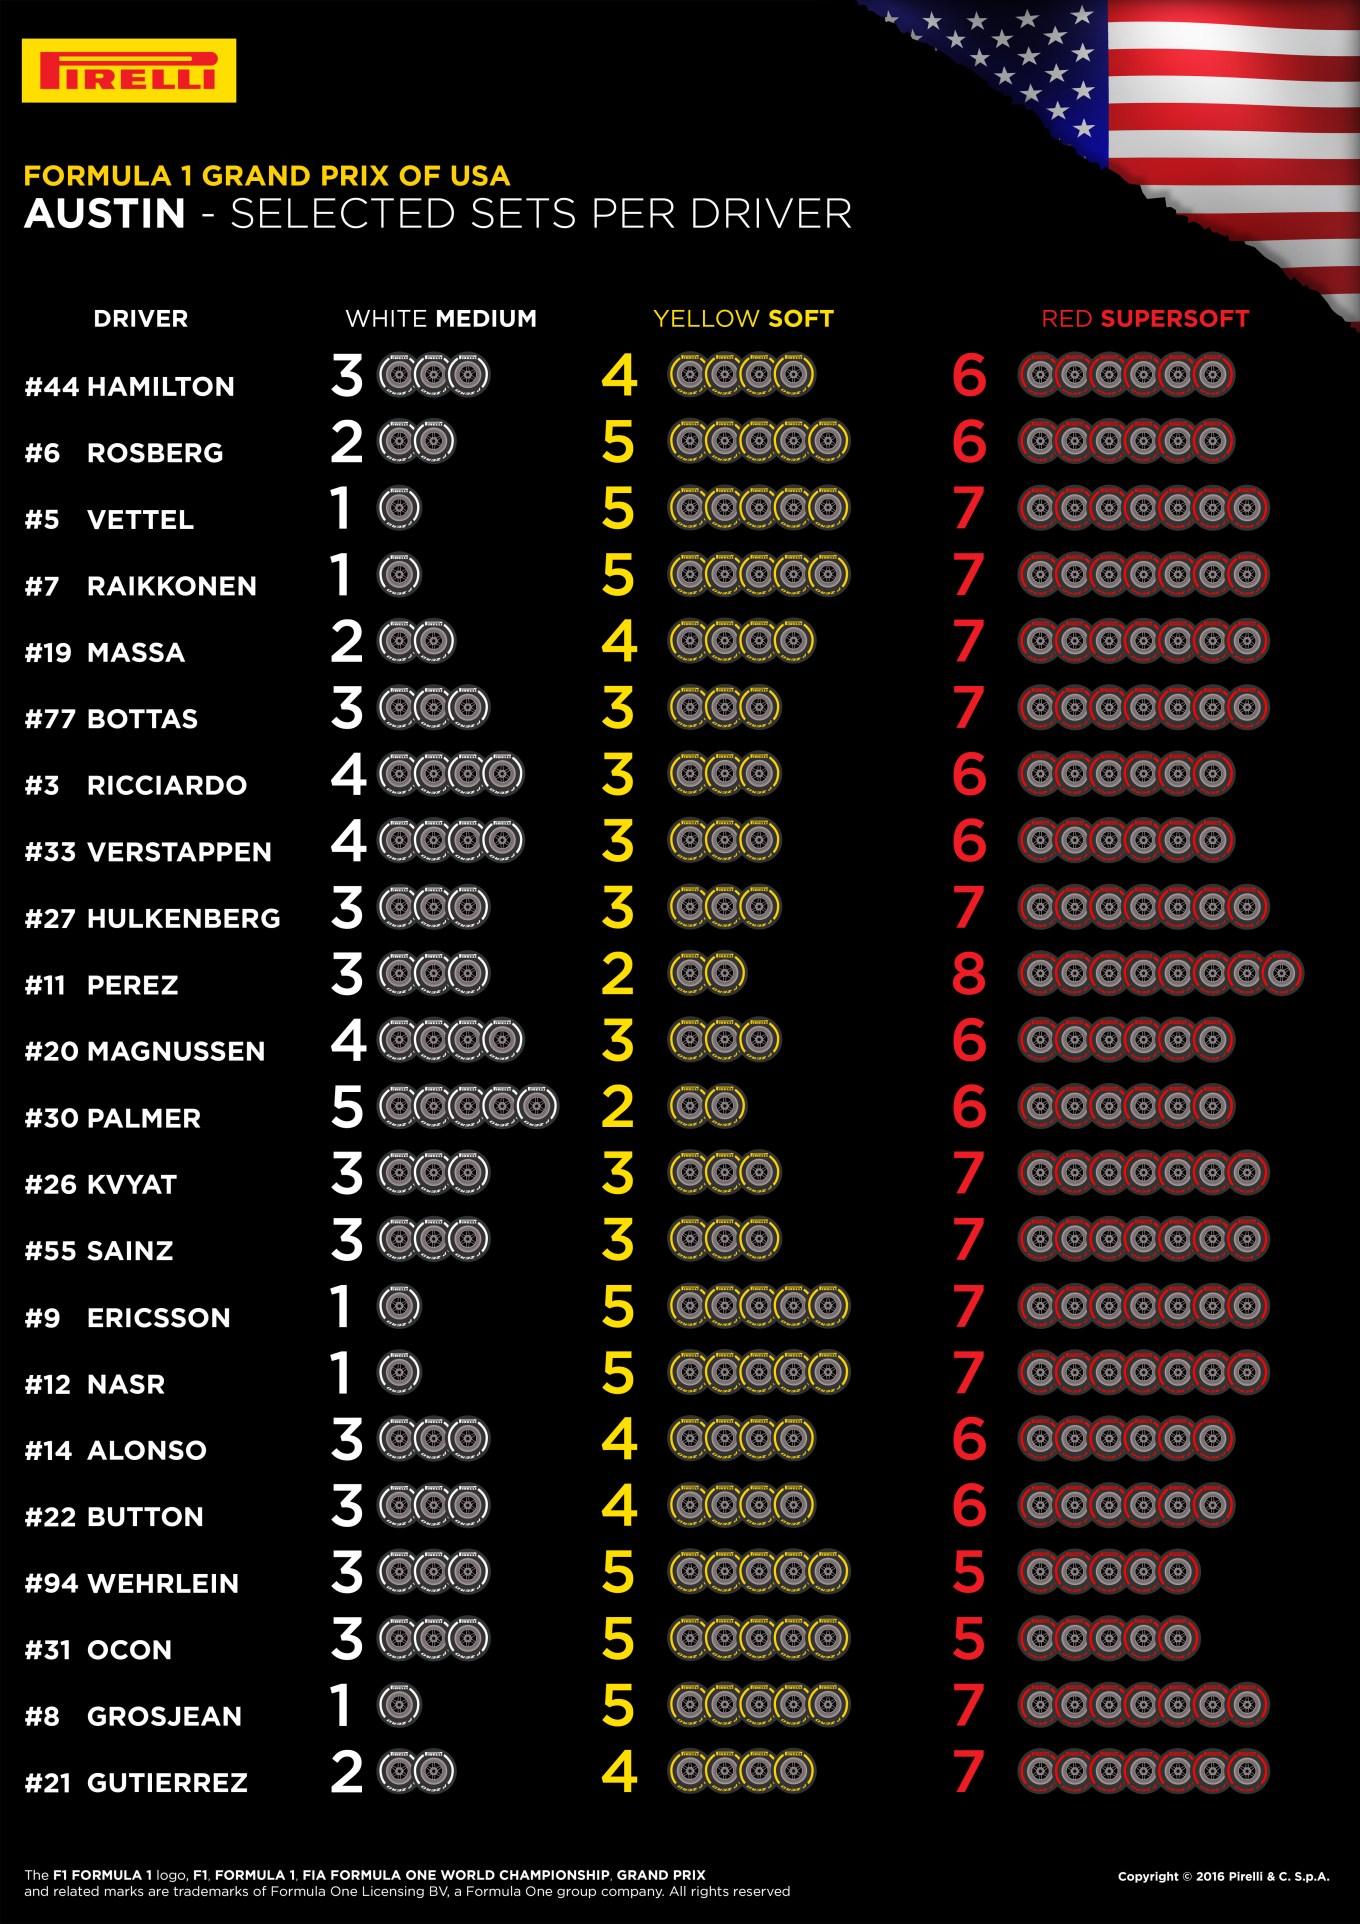 18-usa-selected-sets-per-driver